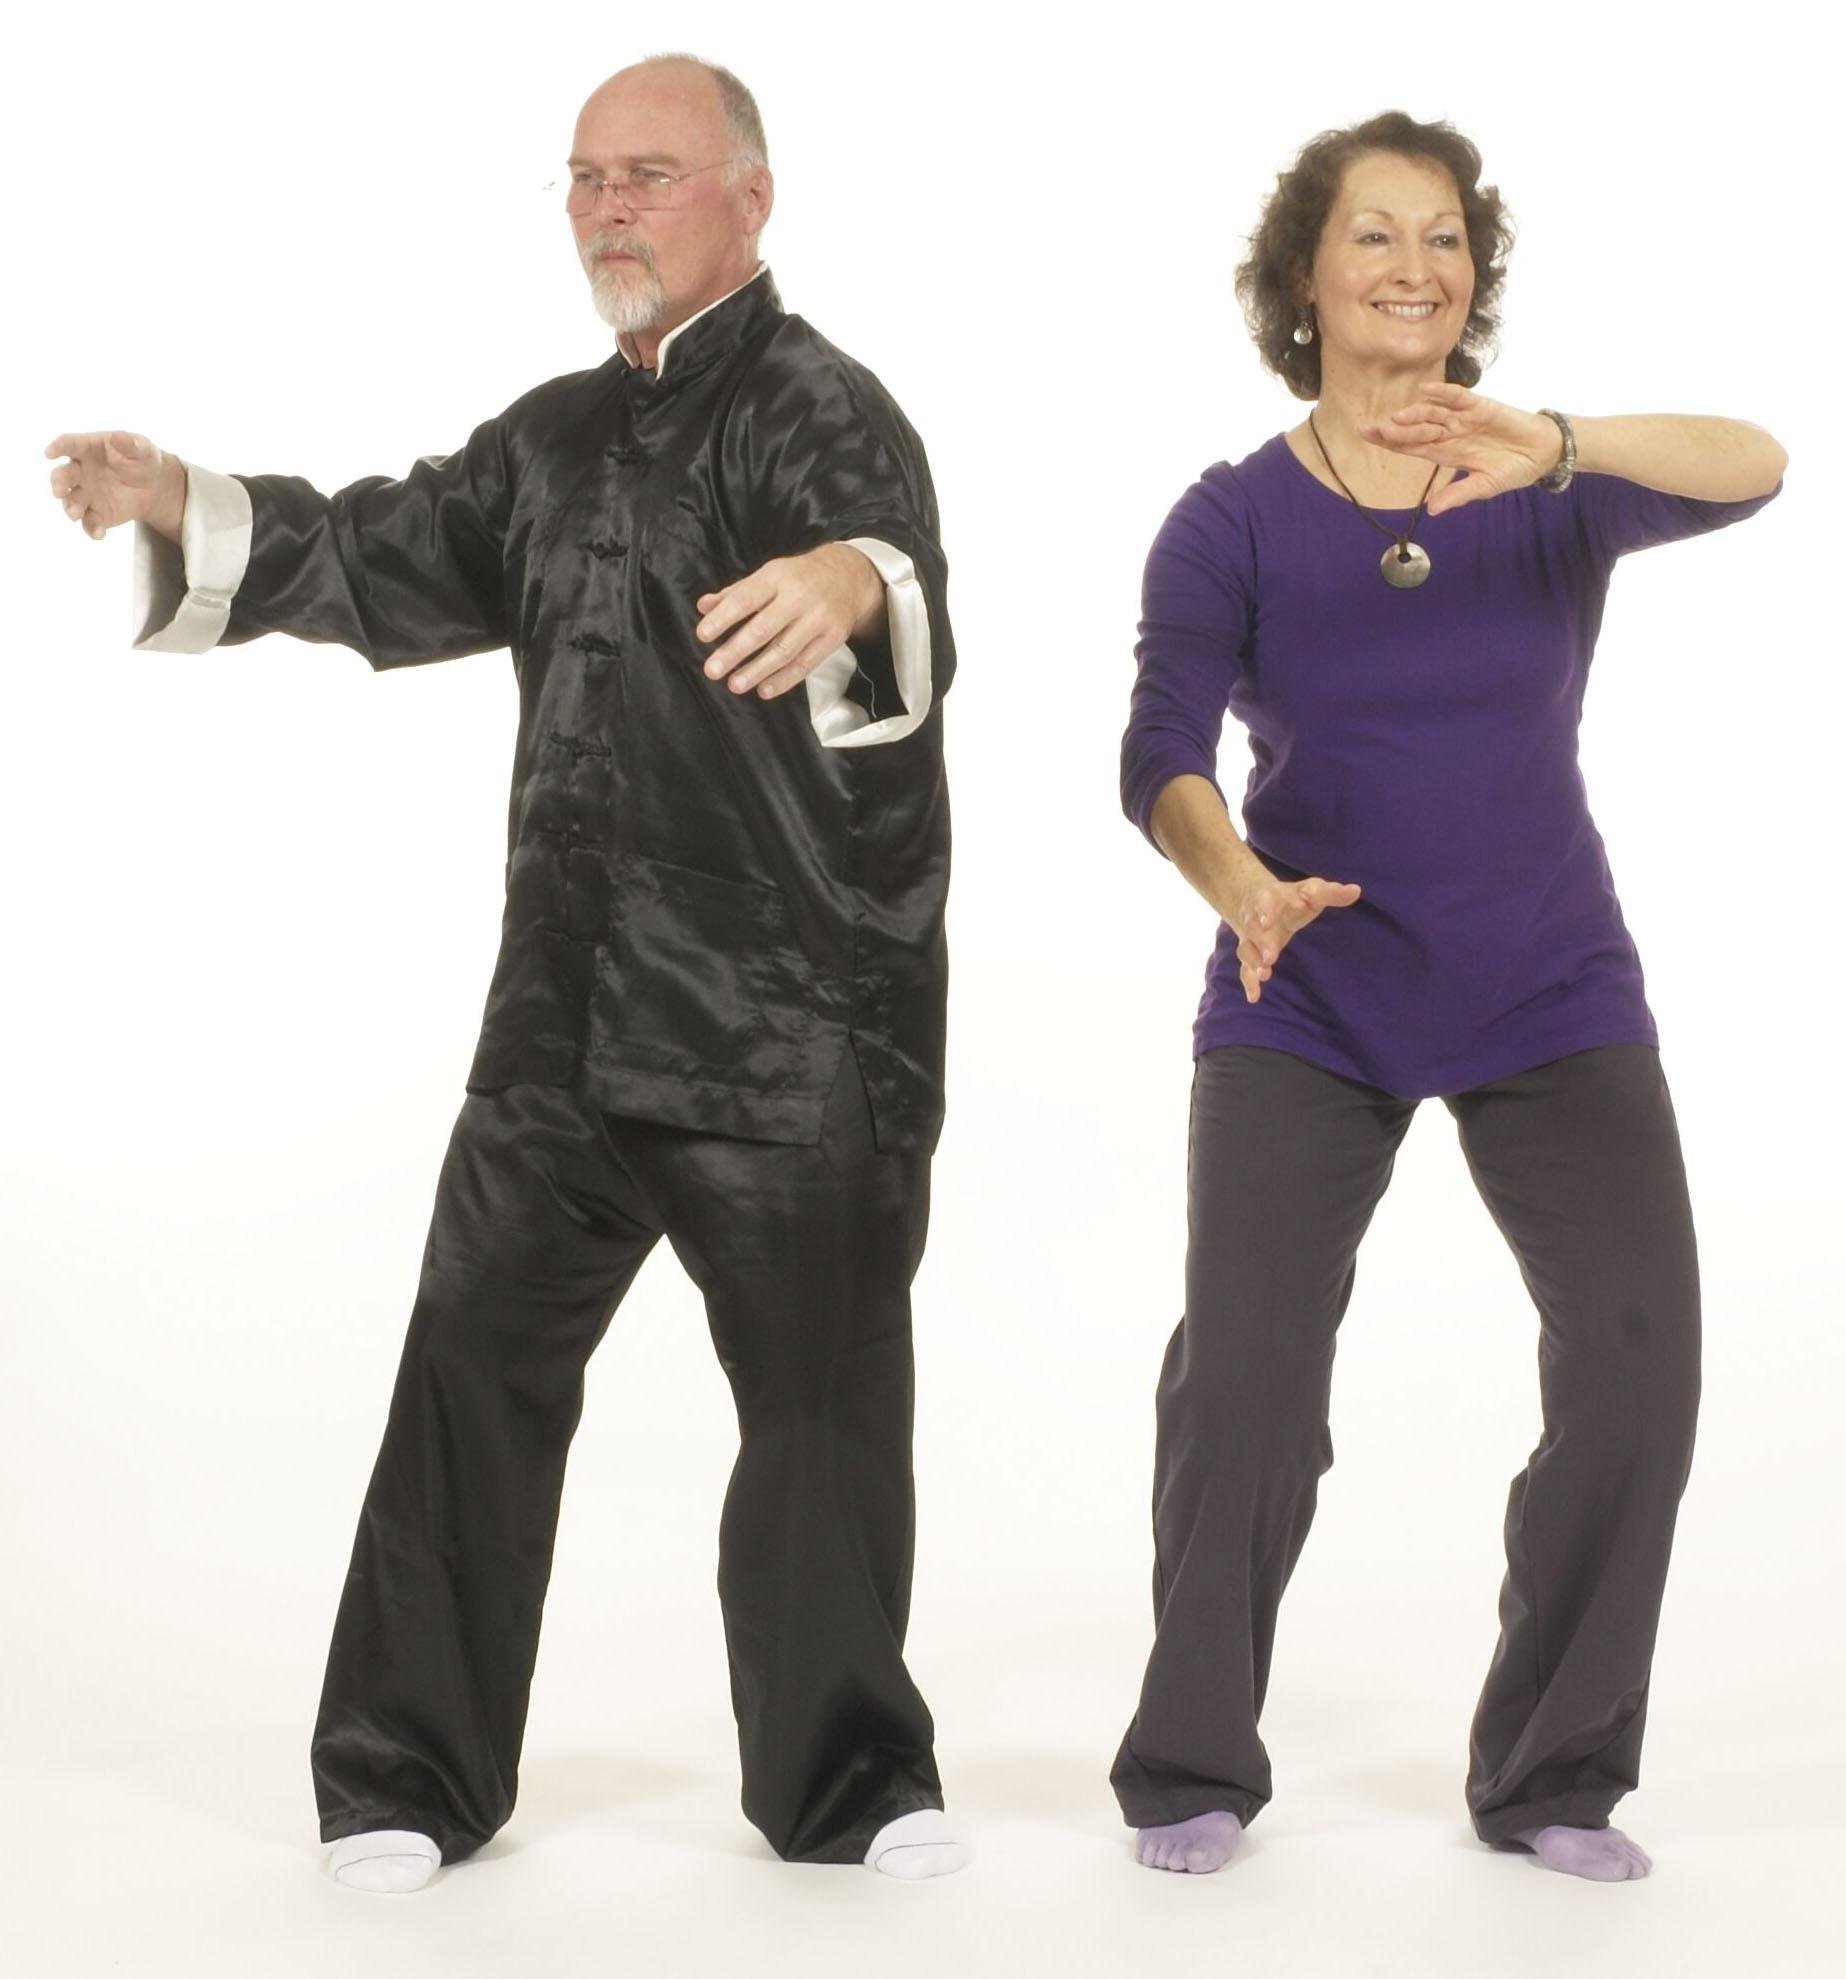 Ian Deavin and Judy Hammond